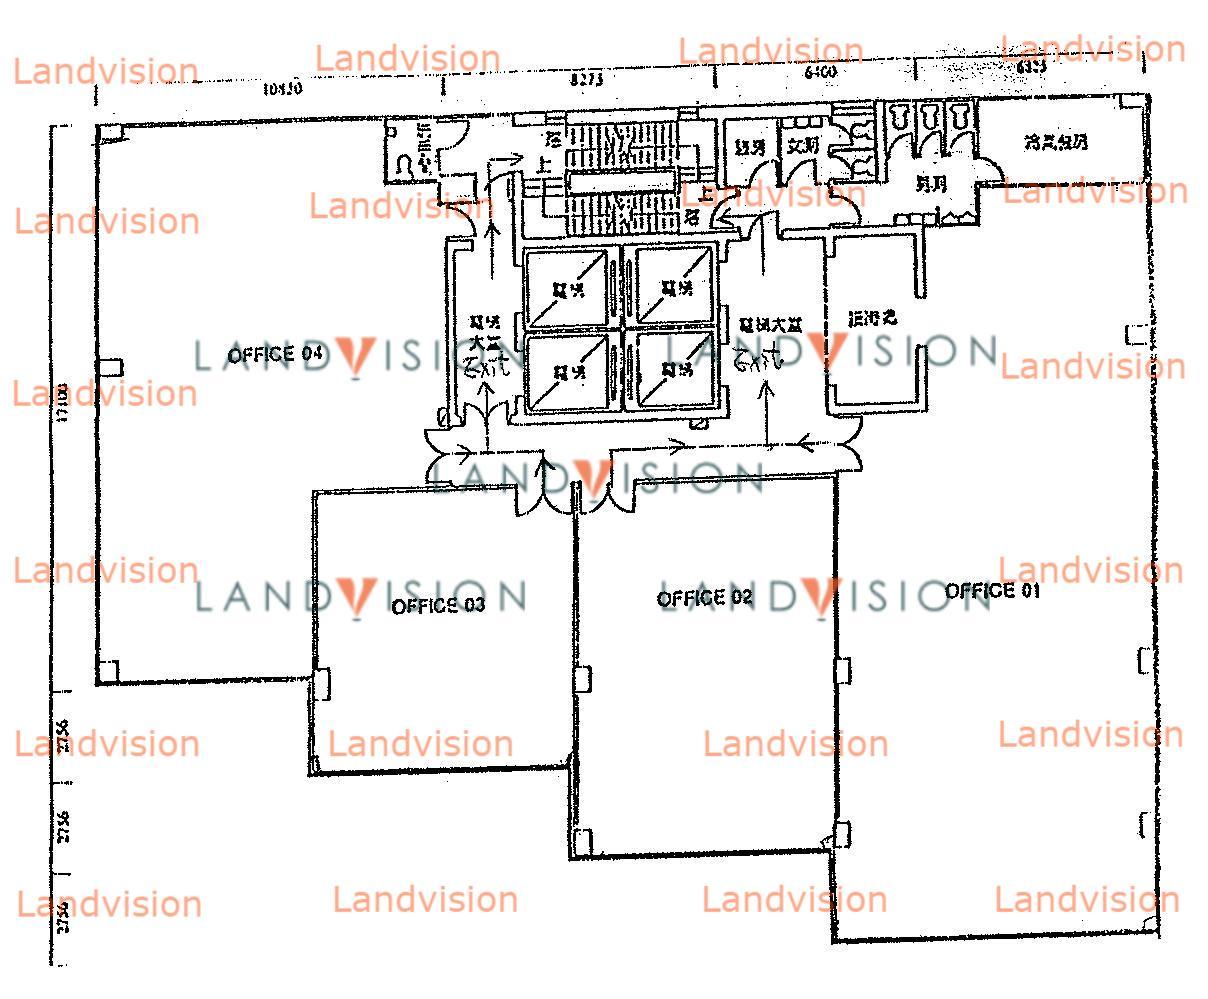 https://www.landvision.com.hk/wp-content/uploads/website/resize/floorplans/000497.JPG